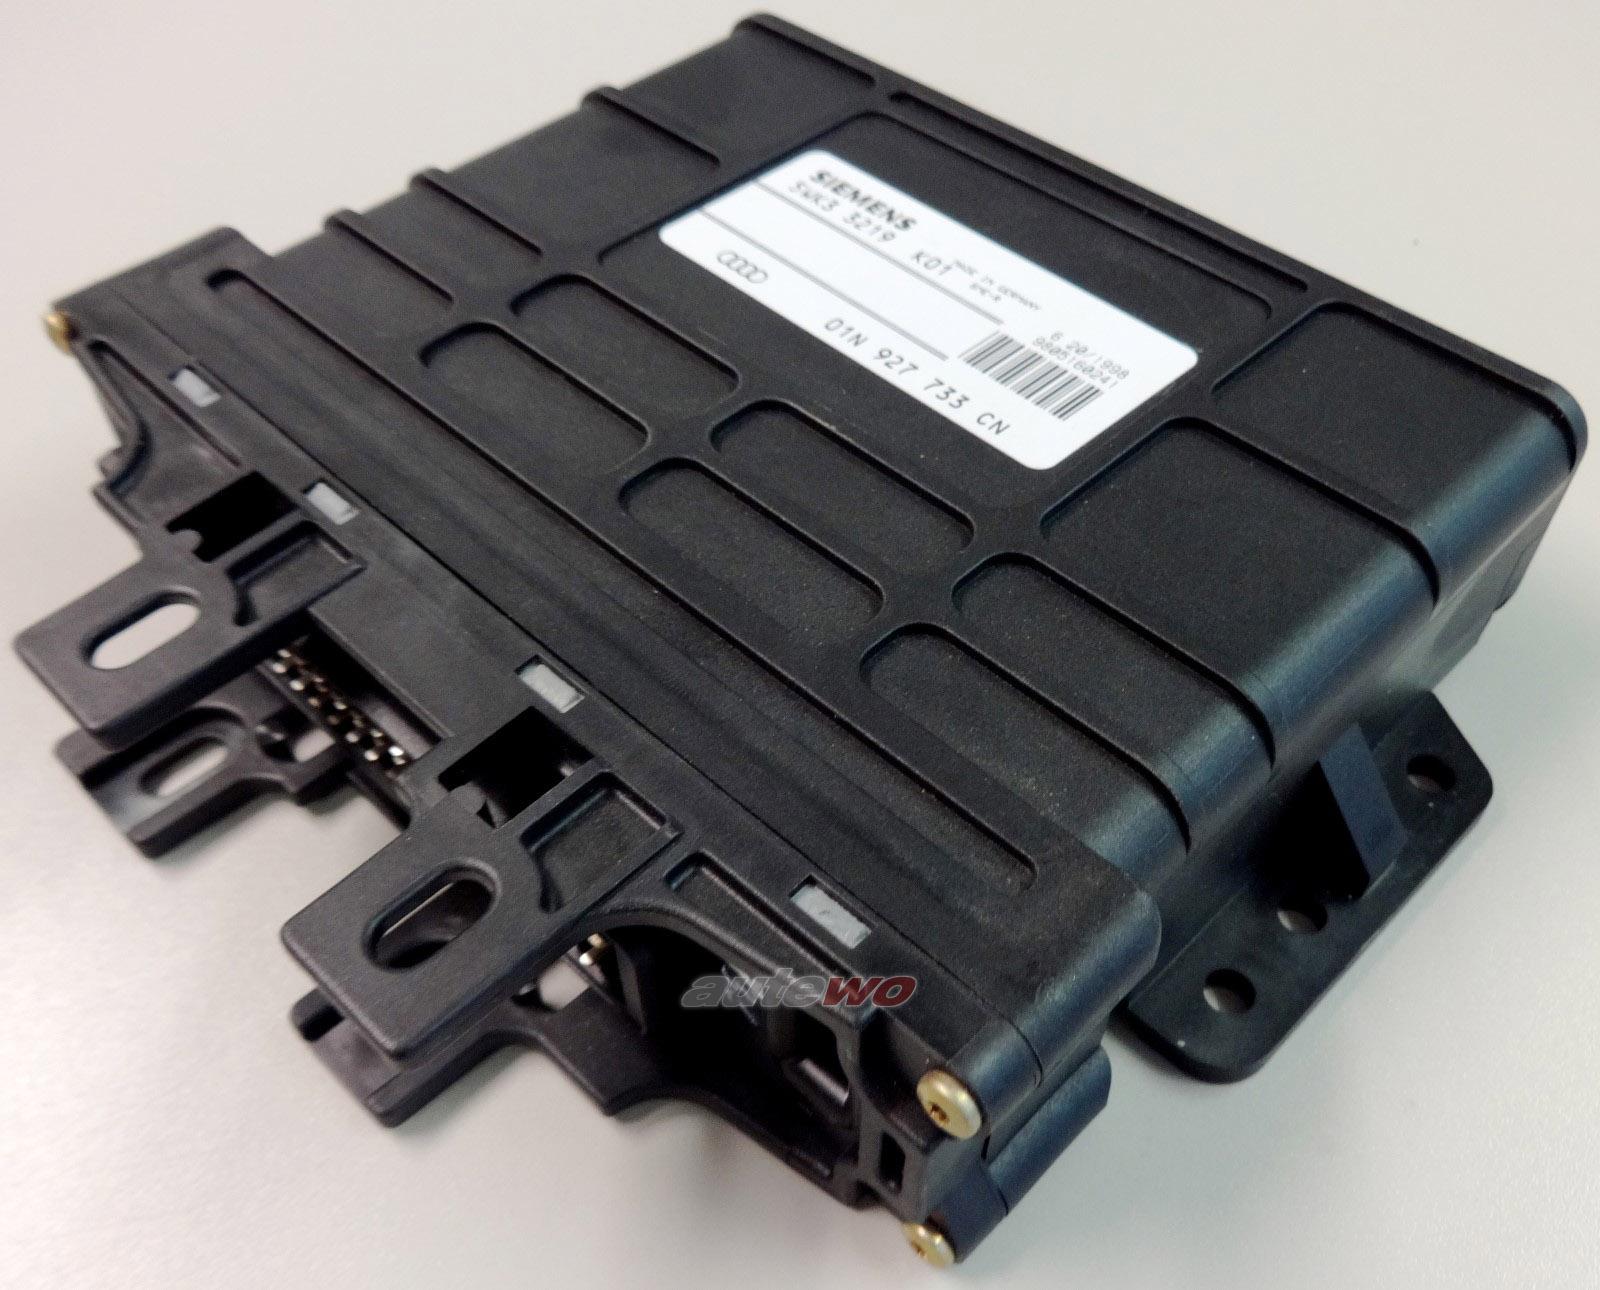 #01N927733EJ/DG 01N927733CN 5WK33219 Audi/VW A4 B5/A6 4B 1.9l TDI Getriebesteuerung